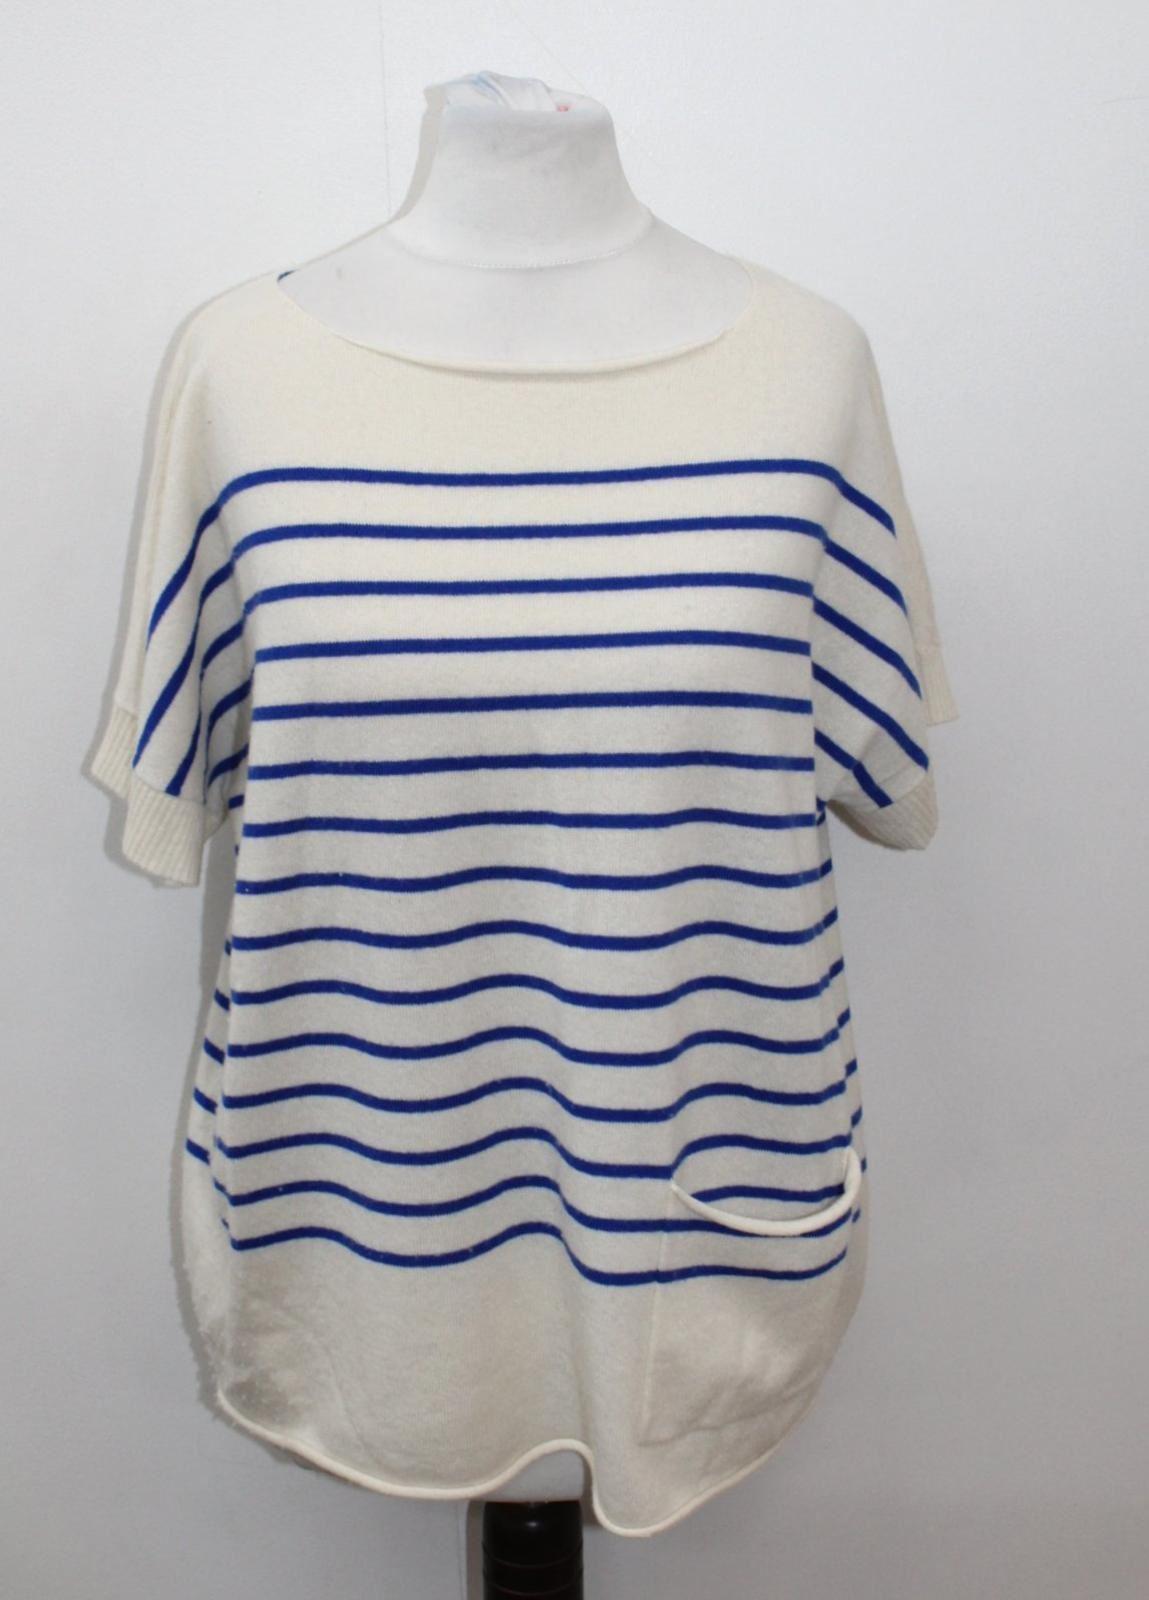 LOMA LONDON Ladies Ivory & Blau Cashmere Short Sleeve Striped Top Größe S